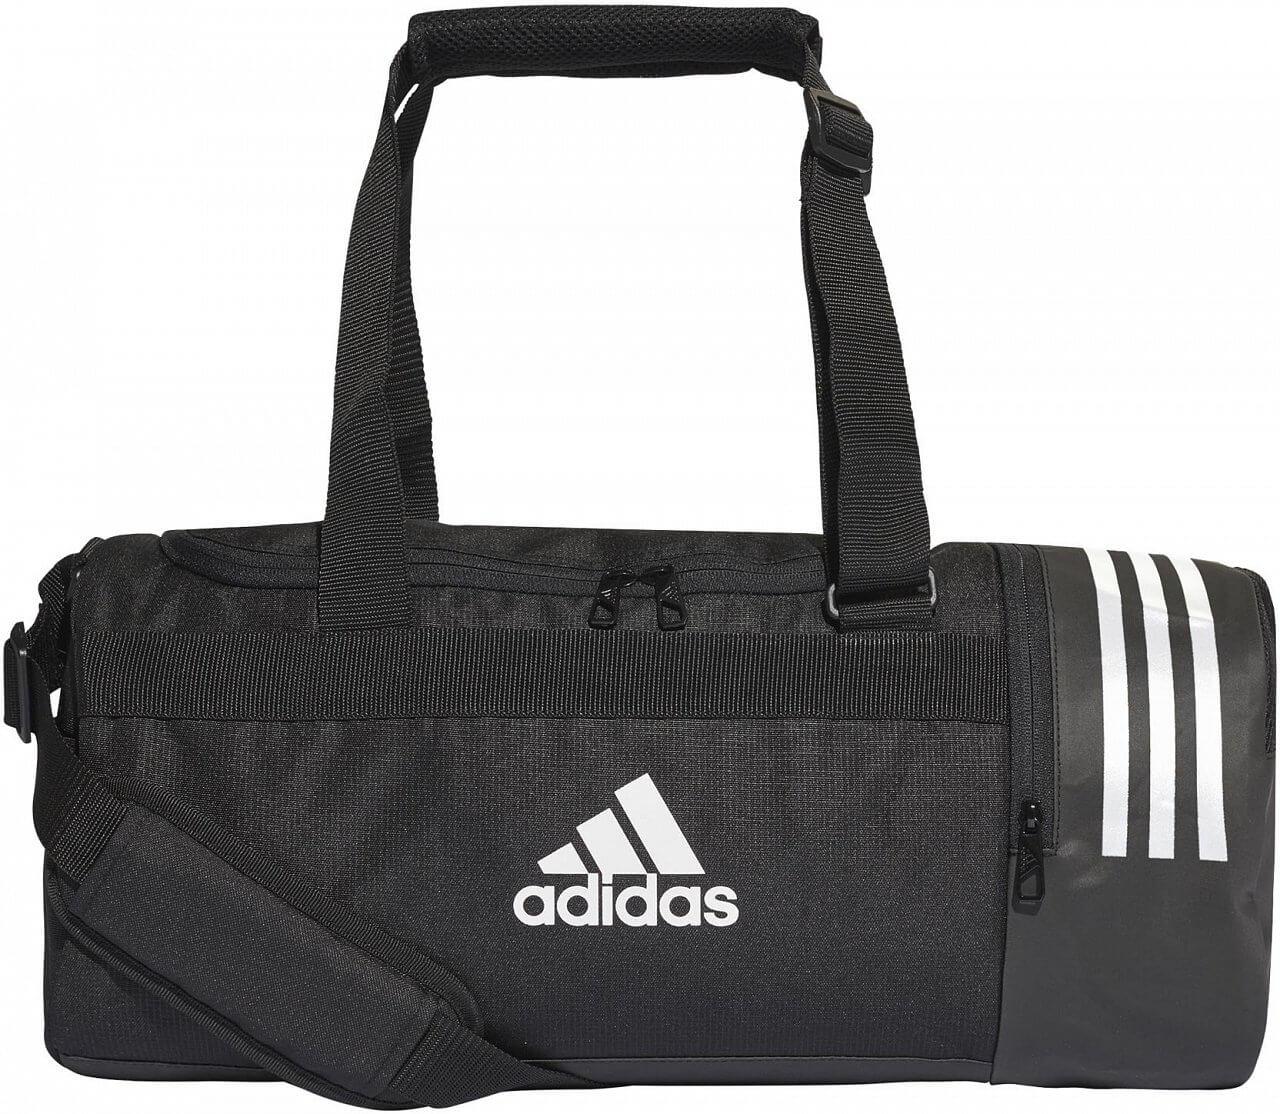 Sportovní taška adidas Convertible 3 Stripes Duffel Bag S